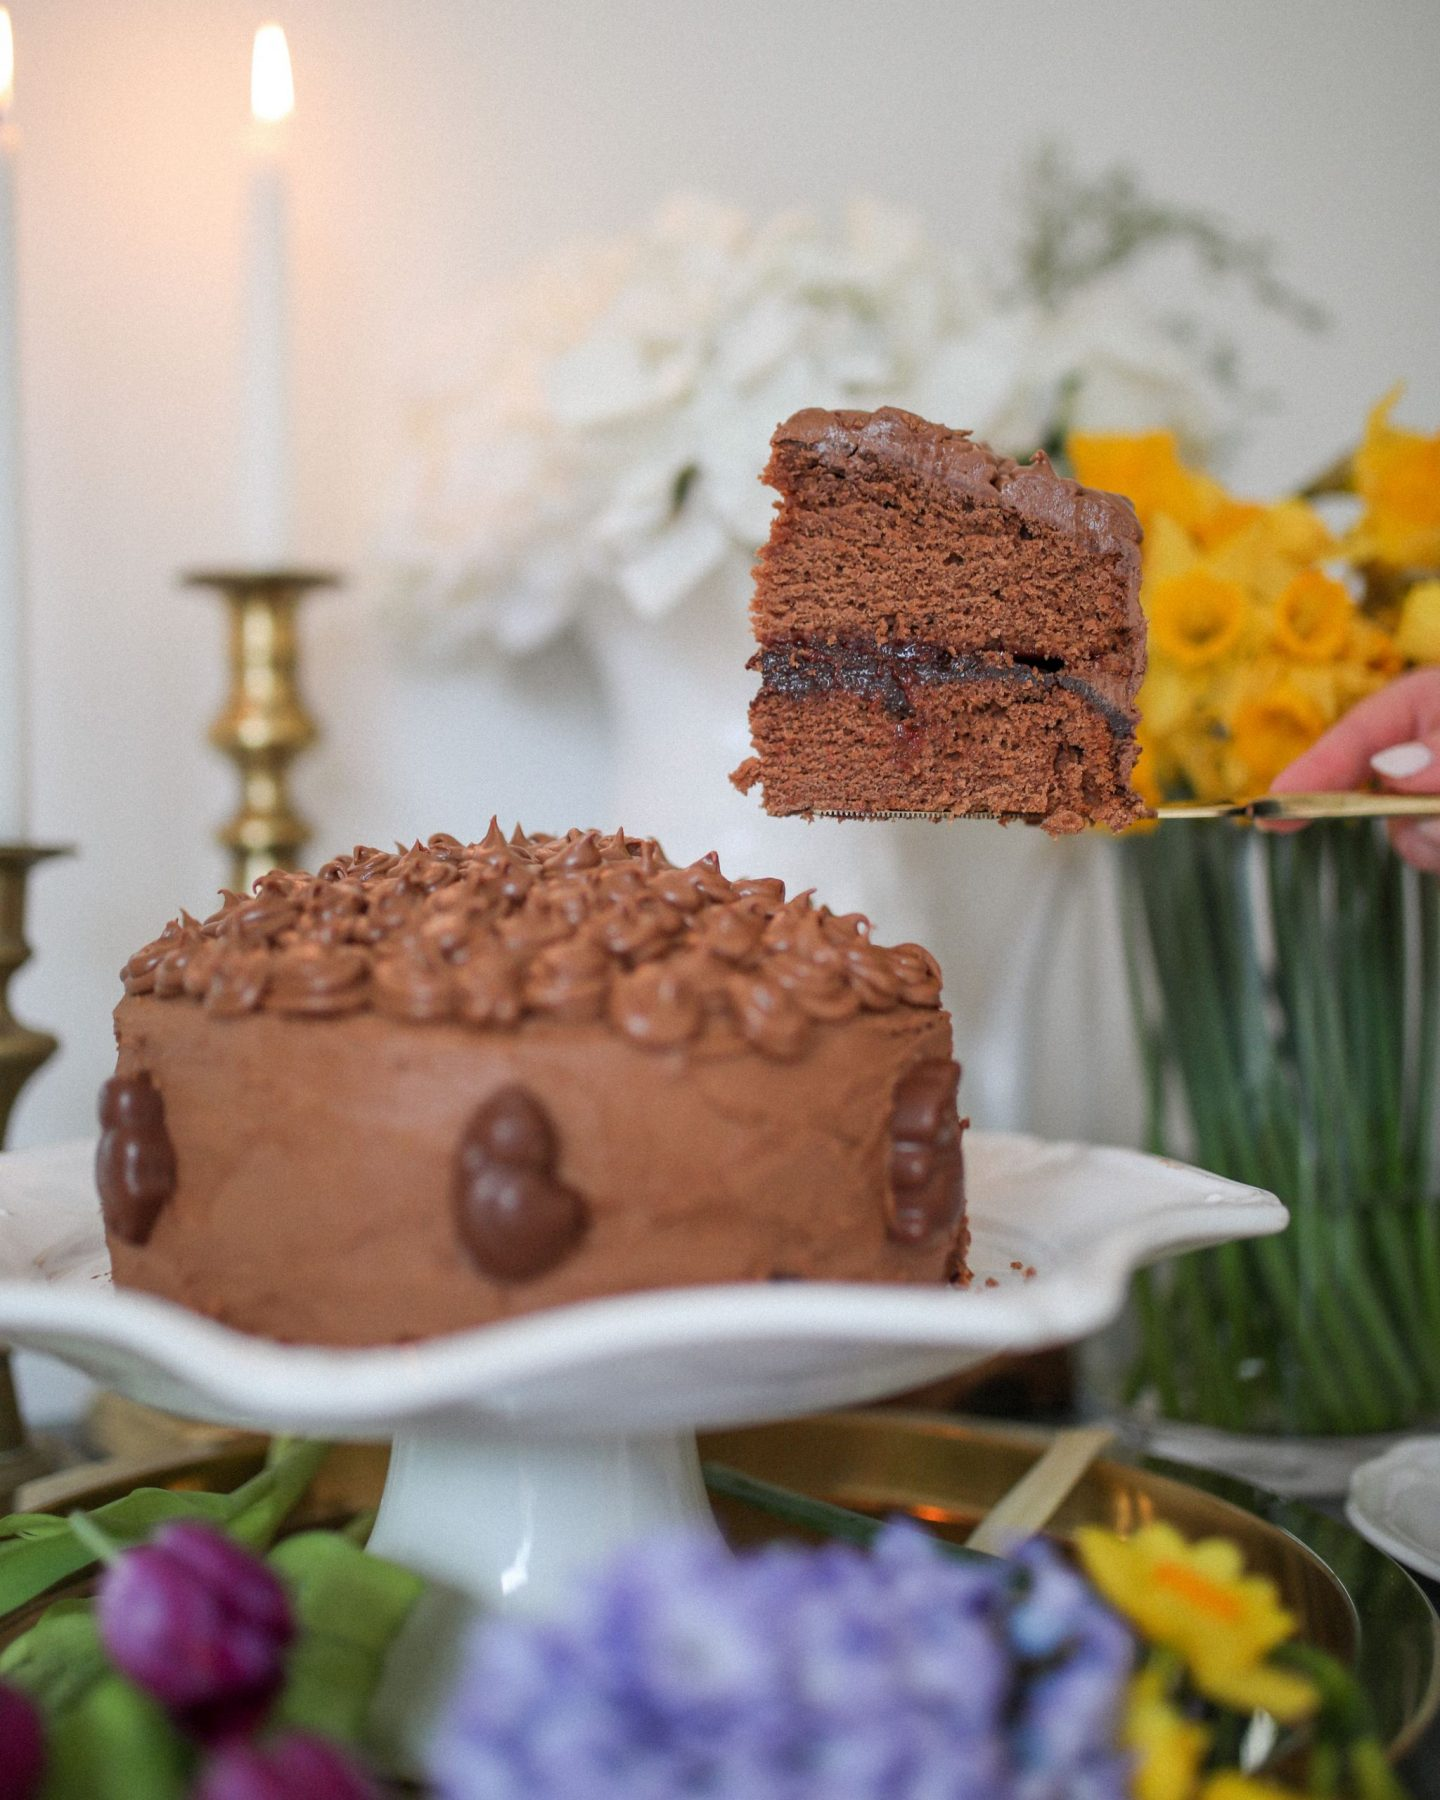 Vegan Chocolate Ganache Iced Cake, Katie Heath, KALANCHOE